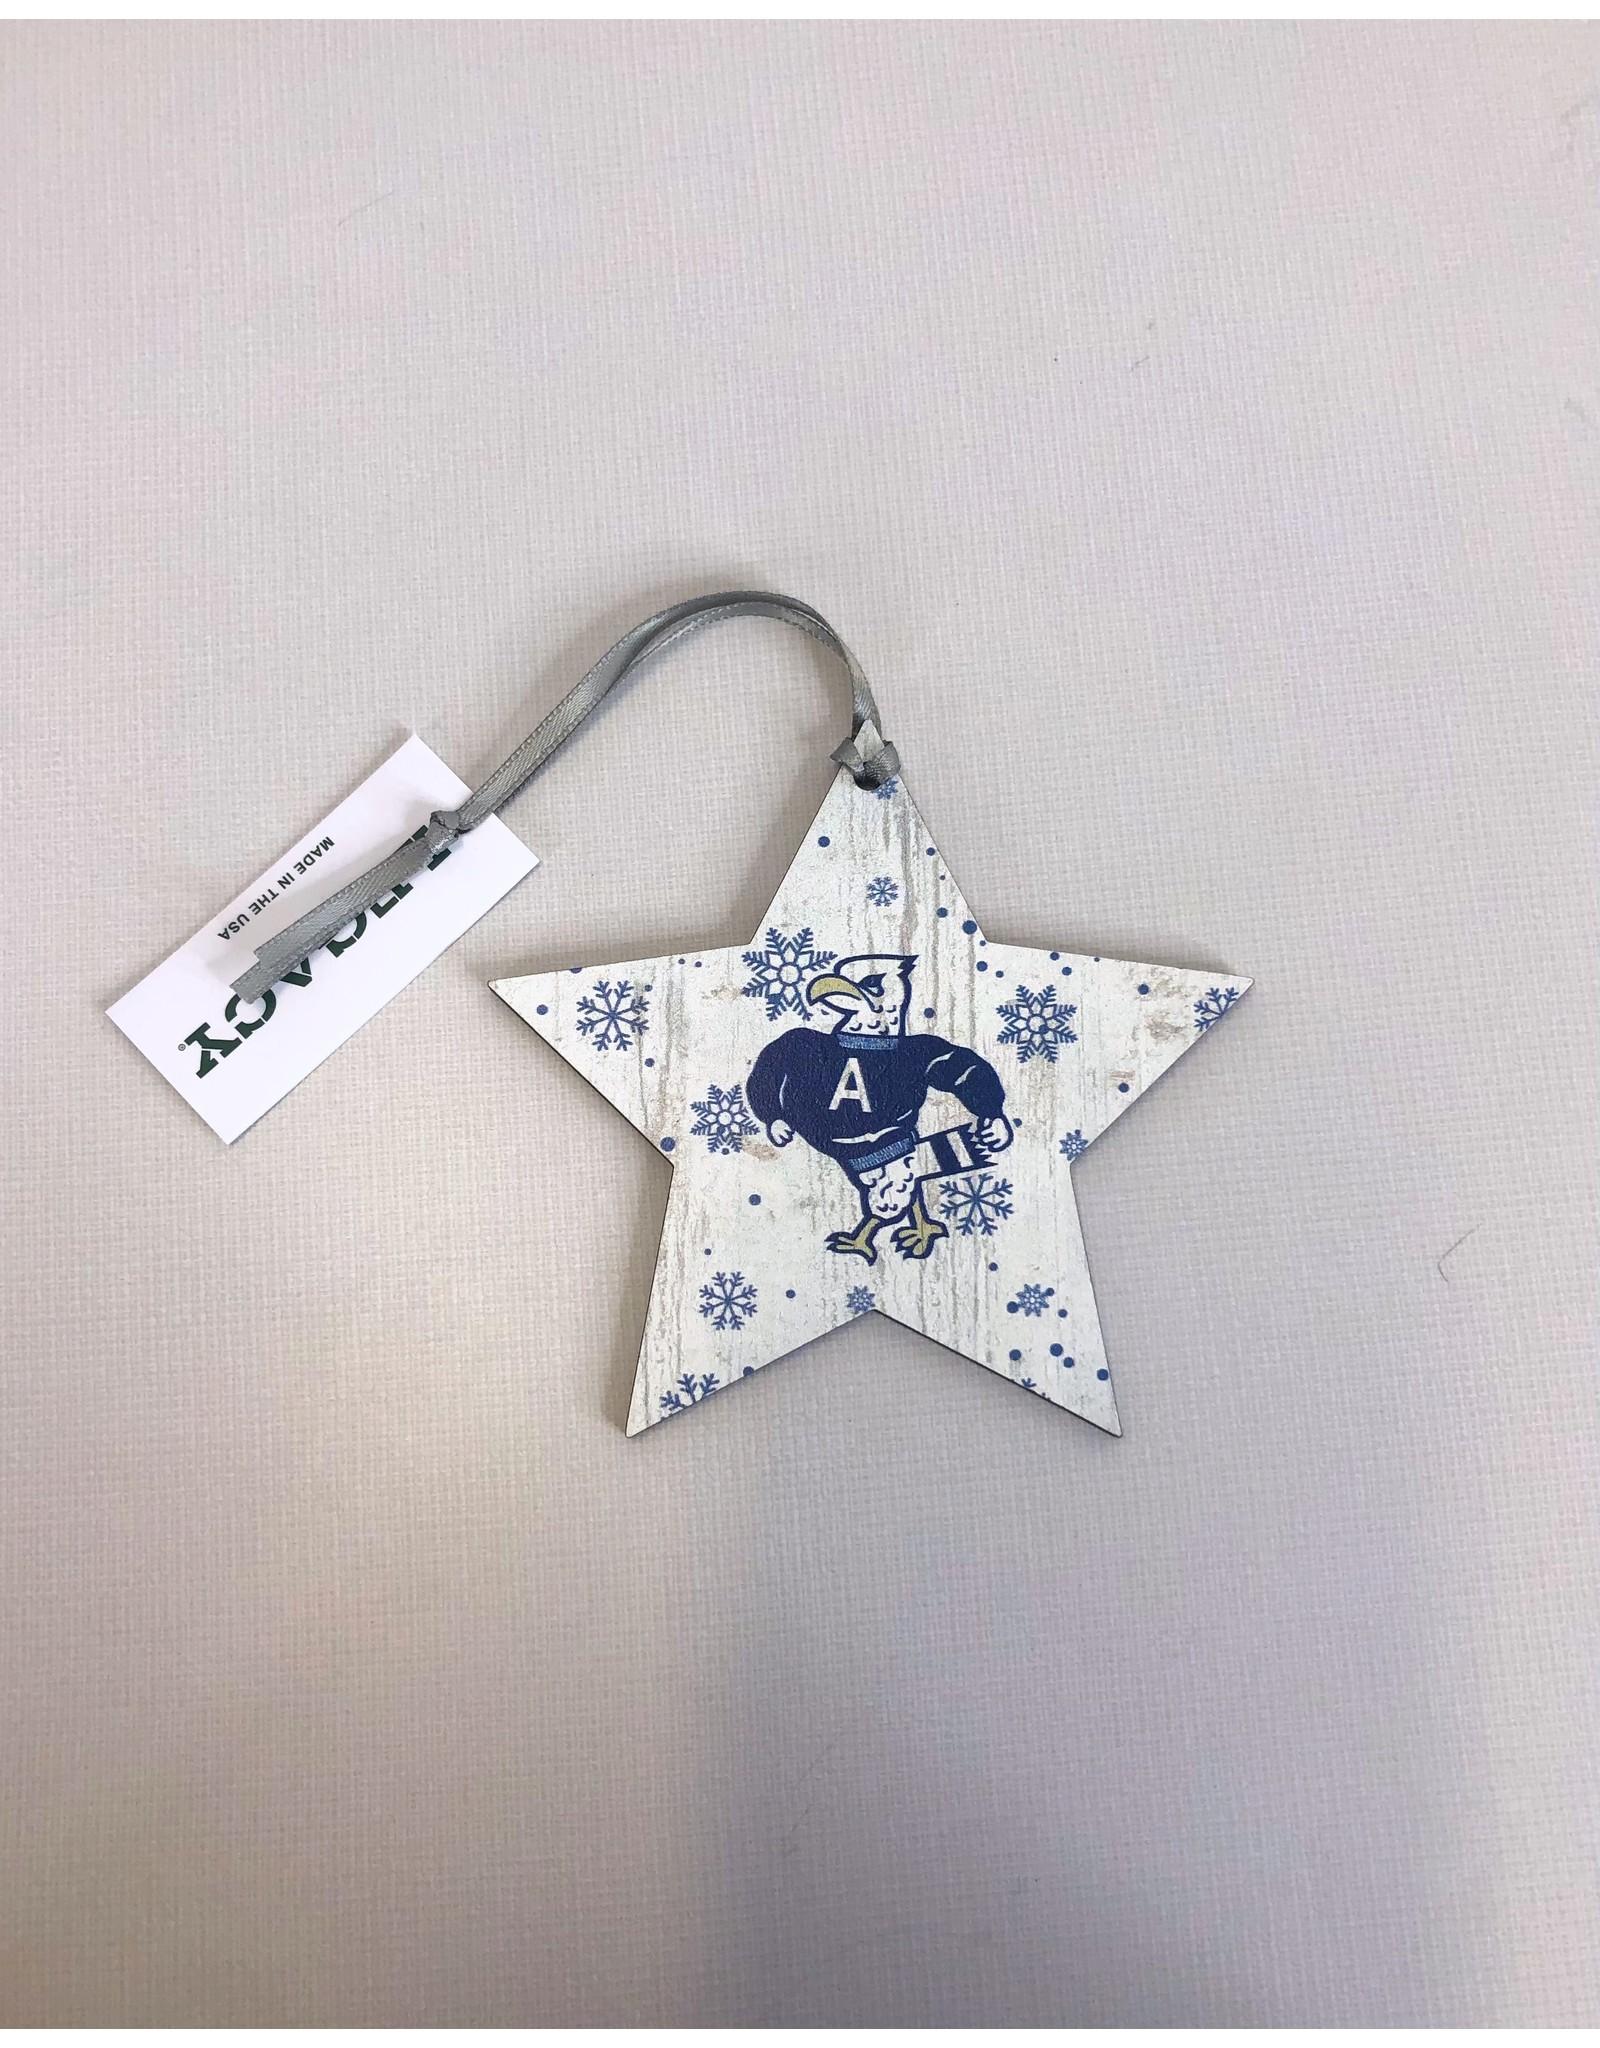 L2 Brands Snowflakes Champ Ornament